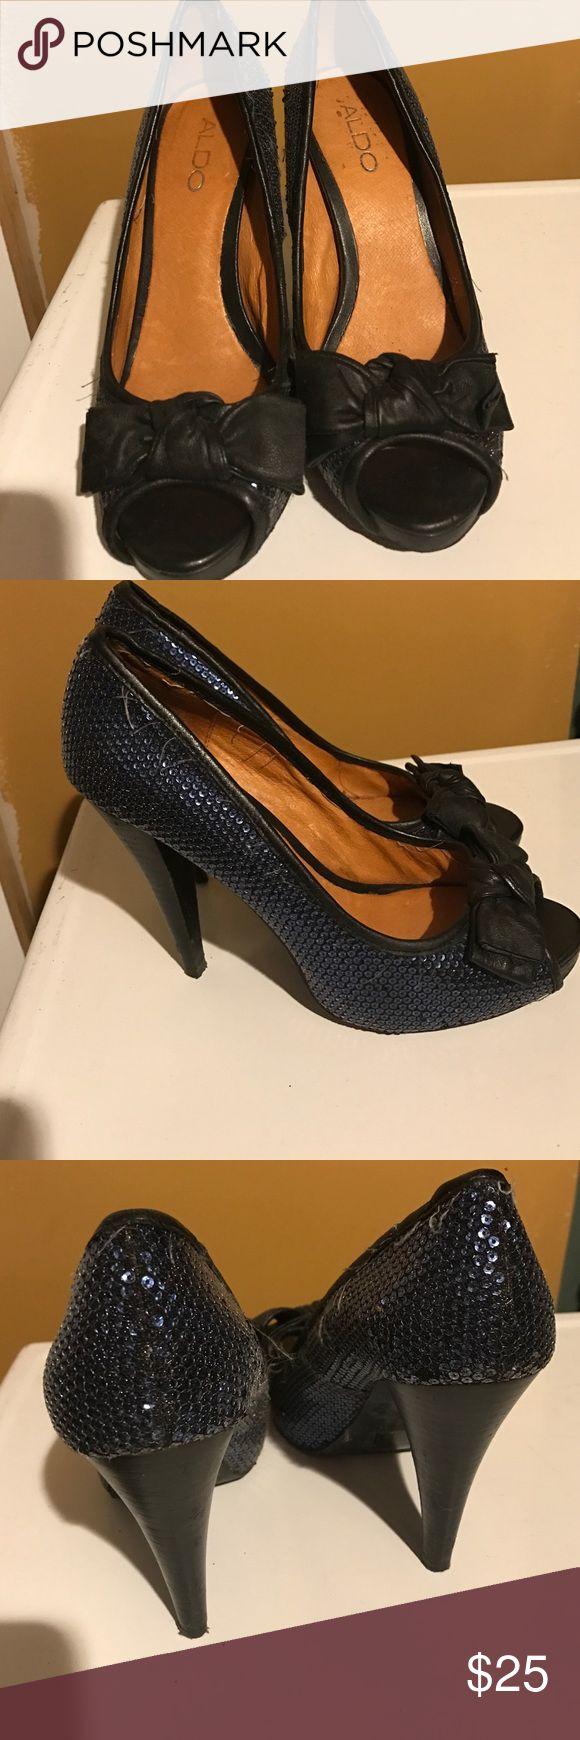 Aldo heels. Sparkle size 37 navy blue and black. Aldo heels. Sparkle size 37 navy blue and black. Aldo Shoes Heels